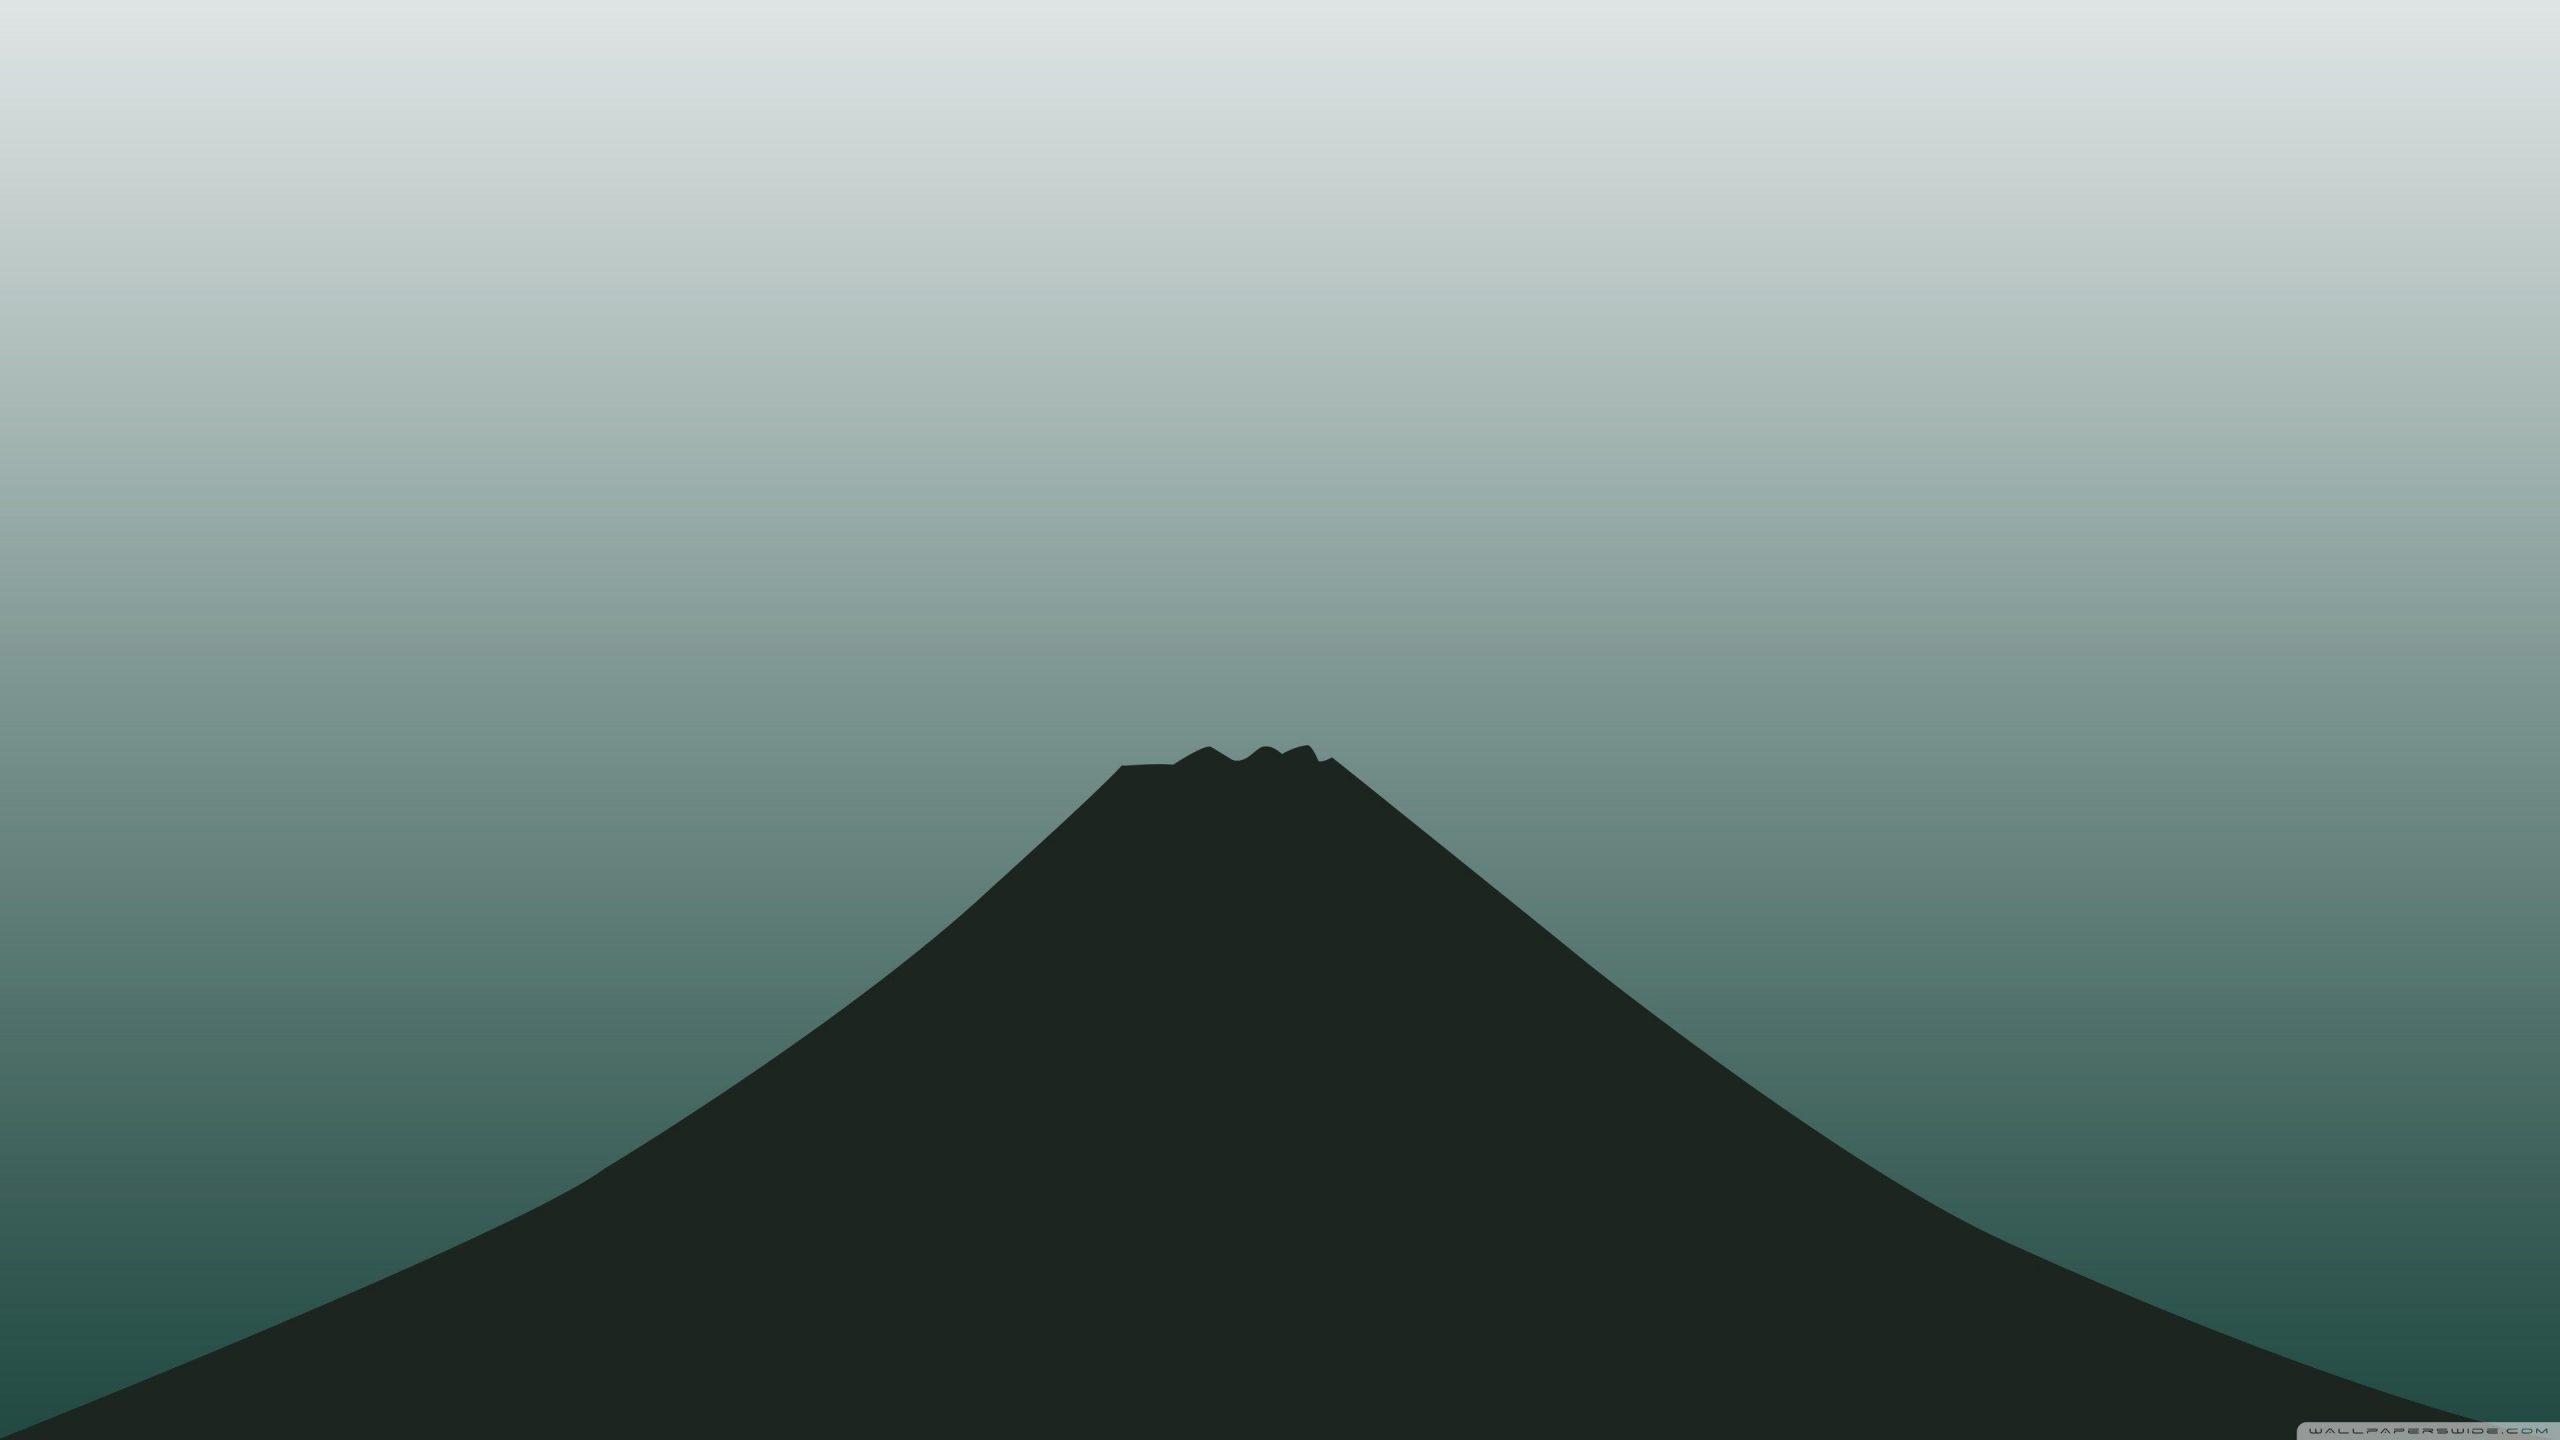 applife-wallpaper-minimalism19